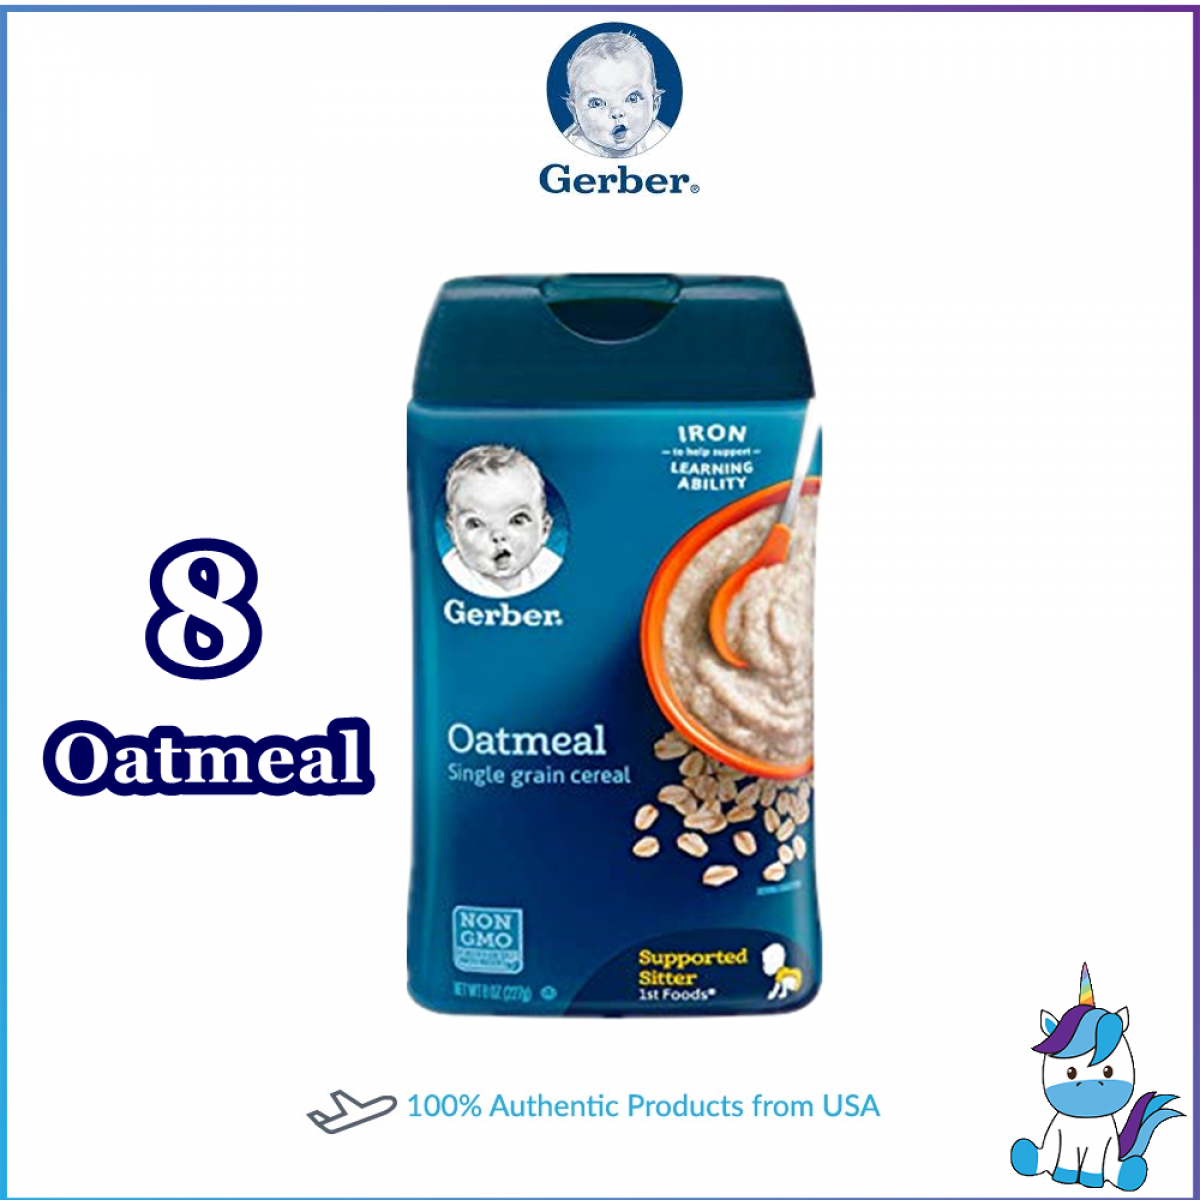 Gerber Cereal Rice Oatmeal DHA Probiotic Single Grain Multigrains Oatmeal Fruits 227g